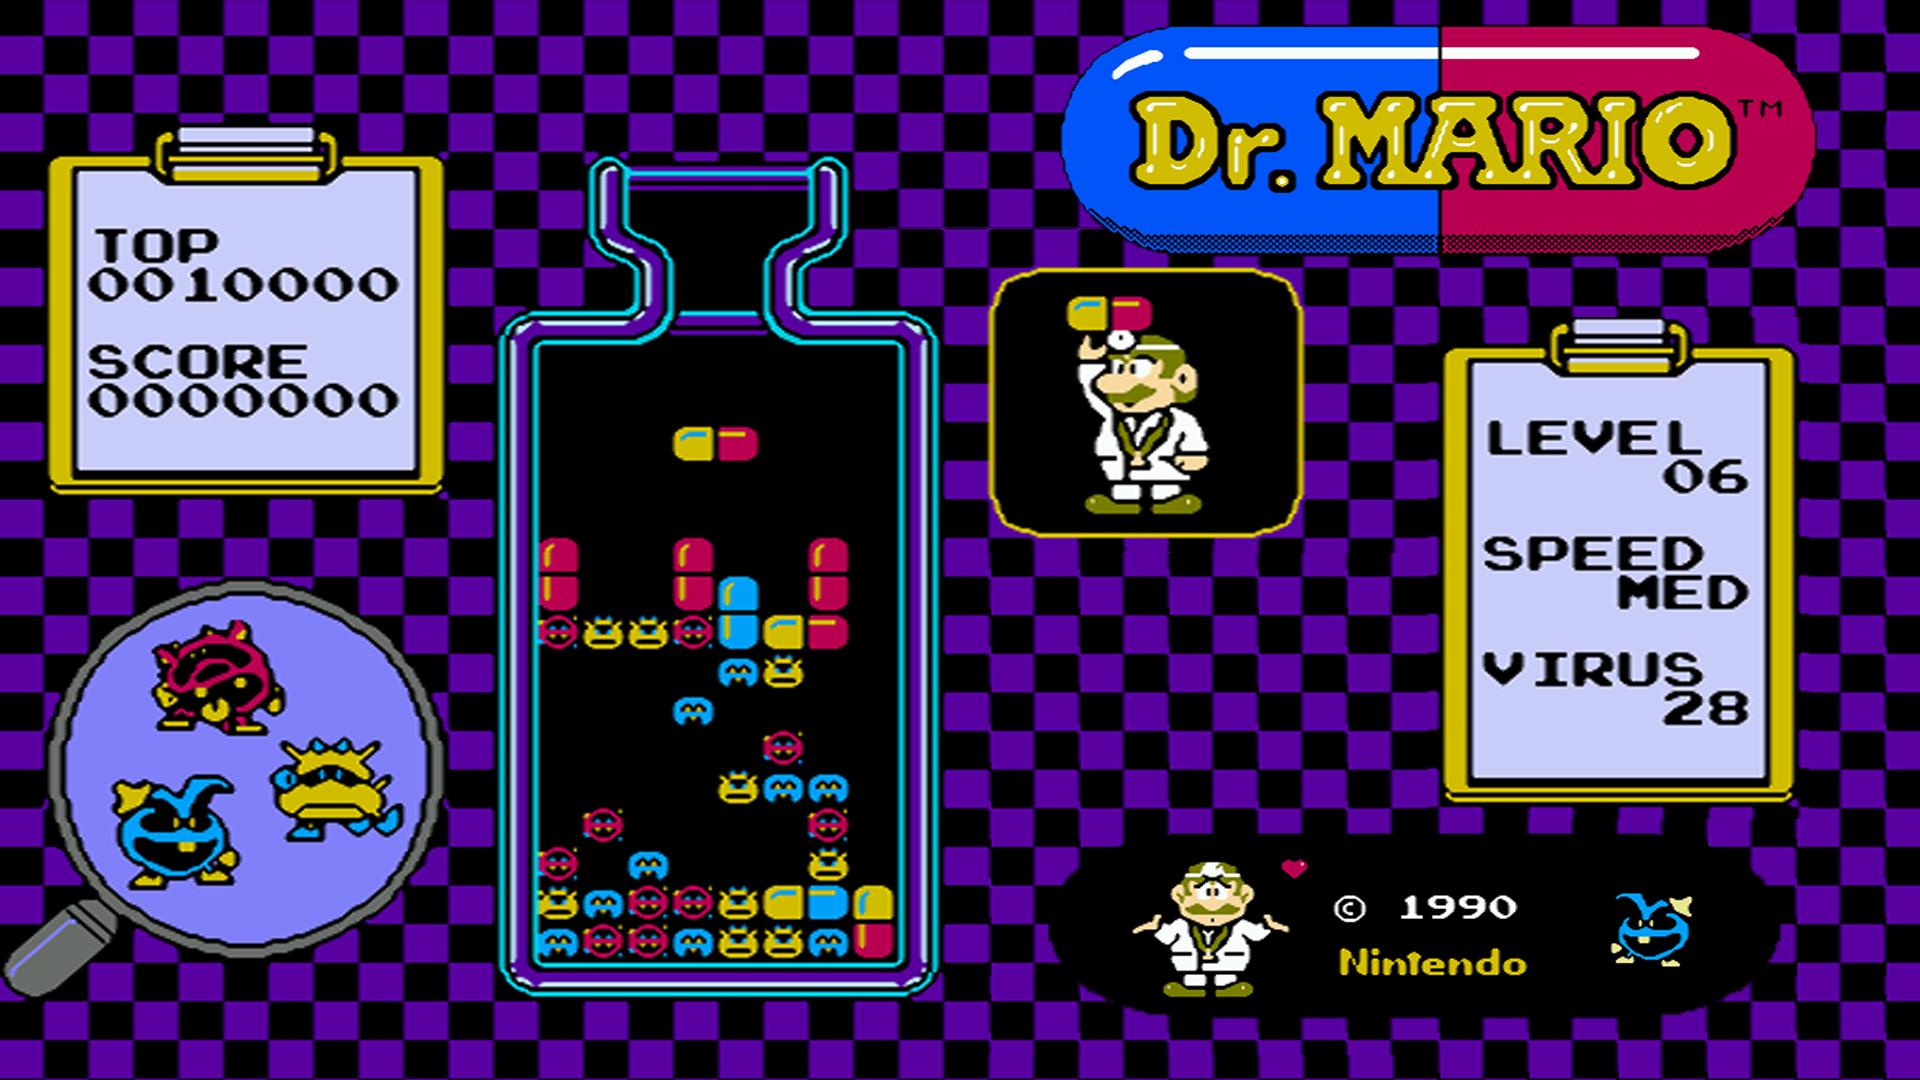 3d Wallpaper Mario Dr Mario Details Launchbox Games Database